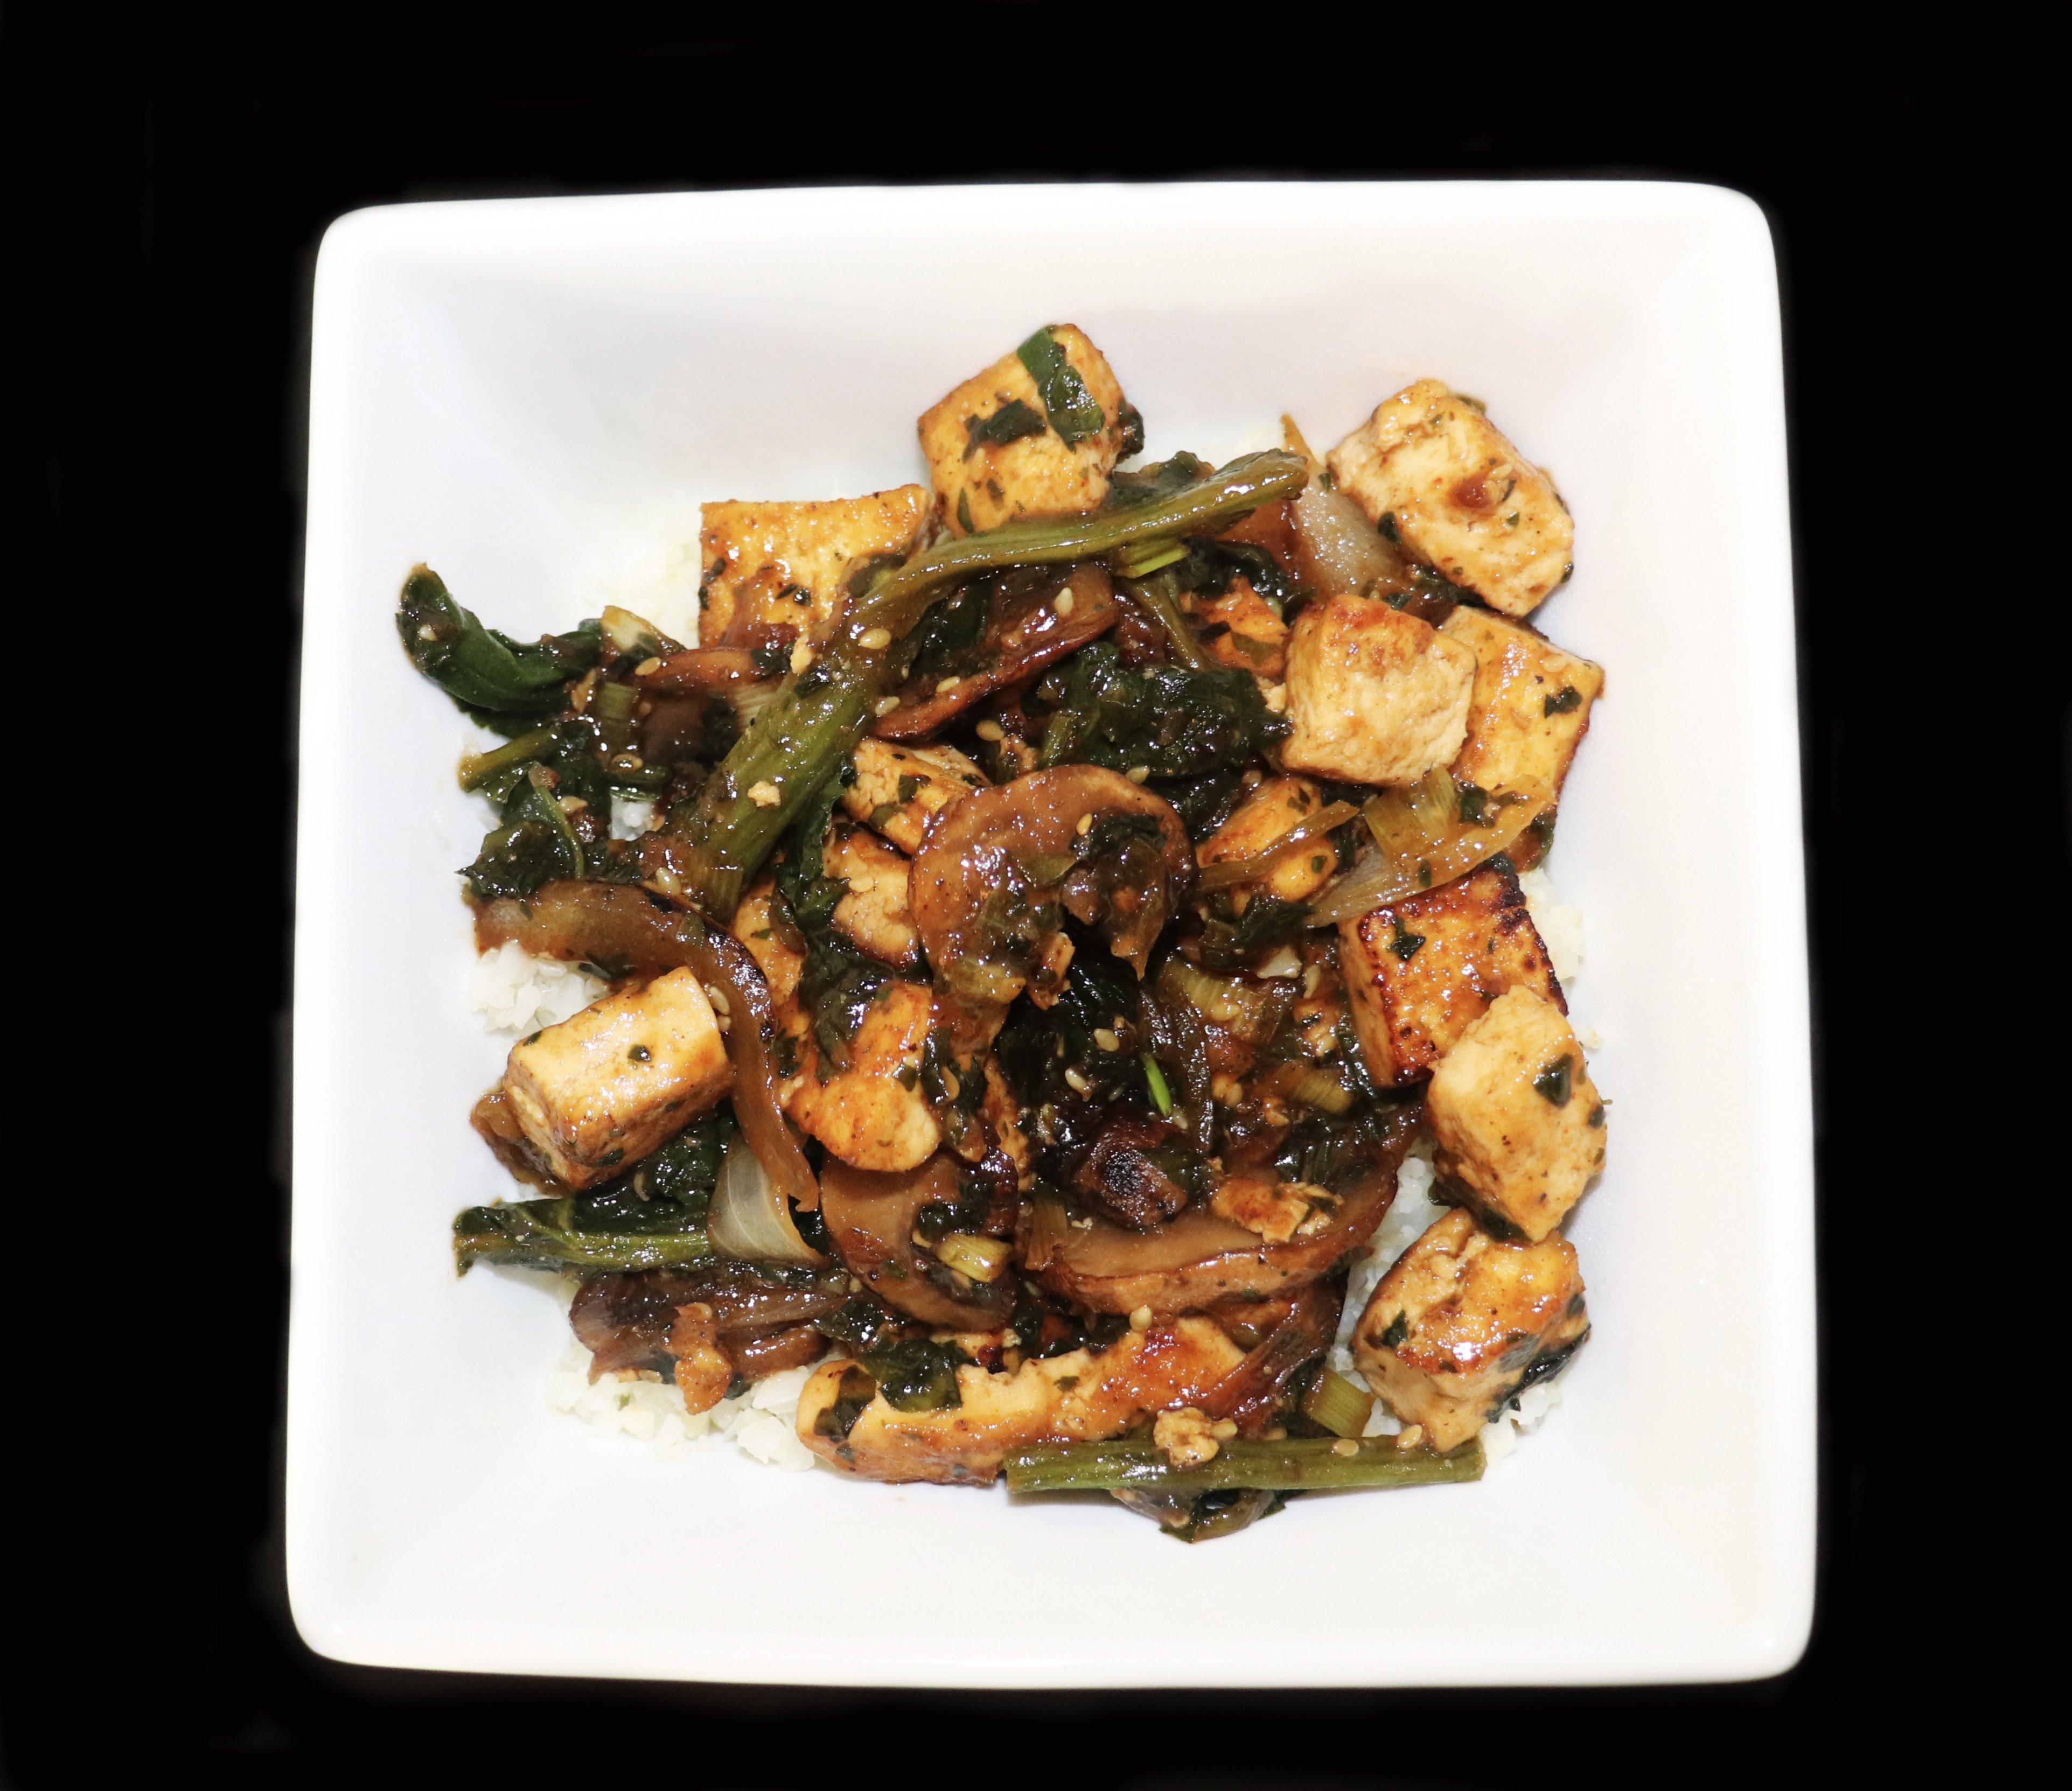 Tofu Stir Fry Recipe With Mushrooms & Spinach